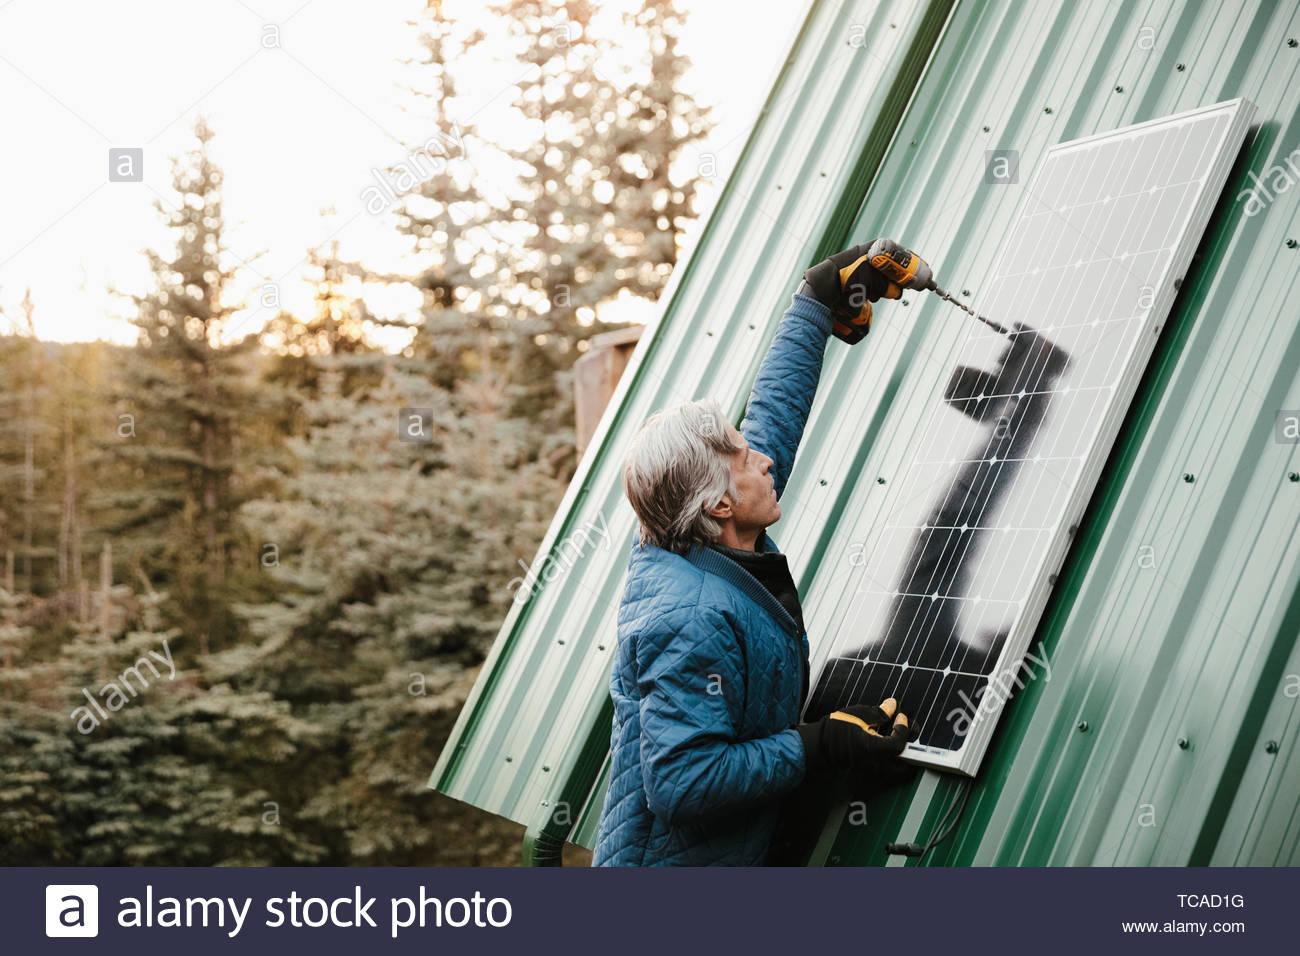 Man installing solar panel on cabin roof - Stock Image